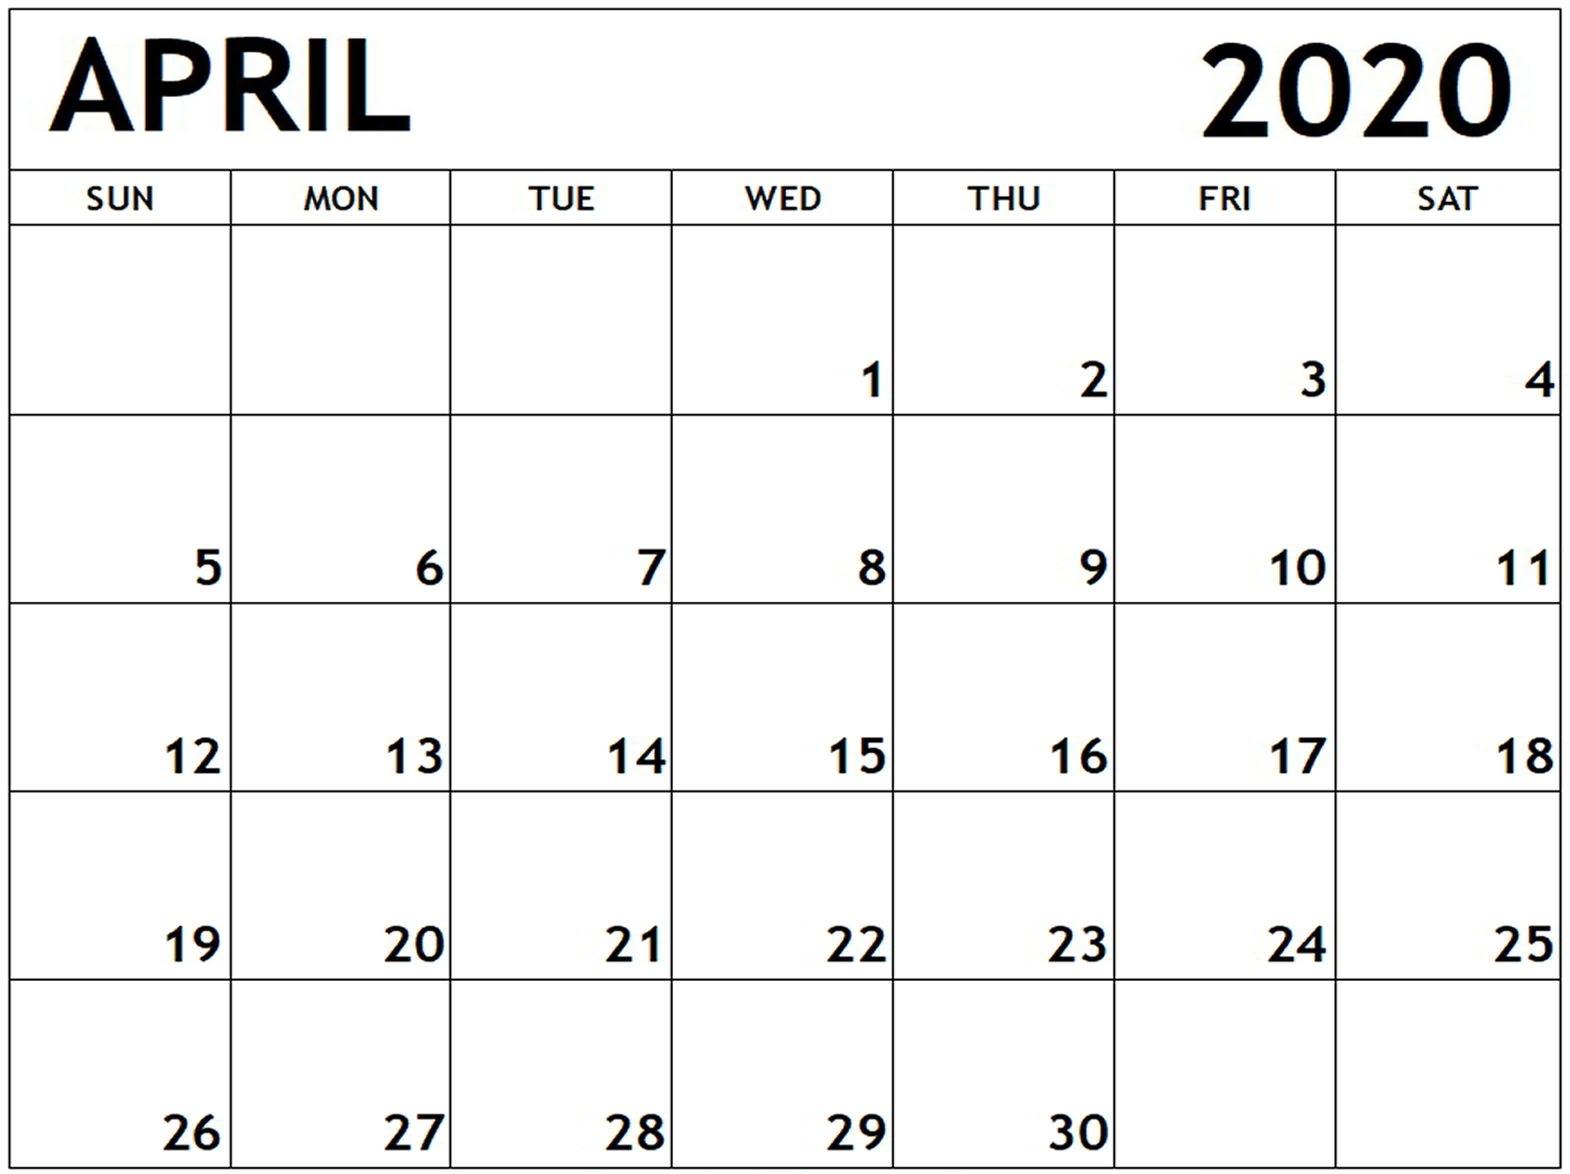 April Calendar 2020 Template